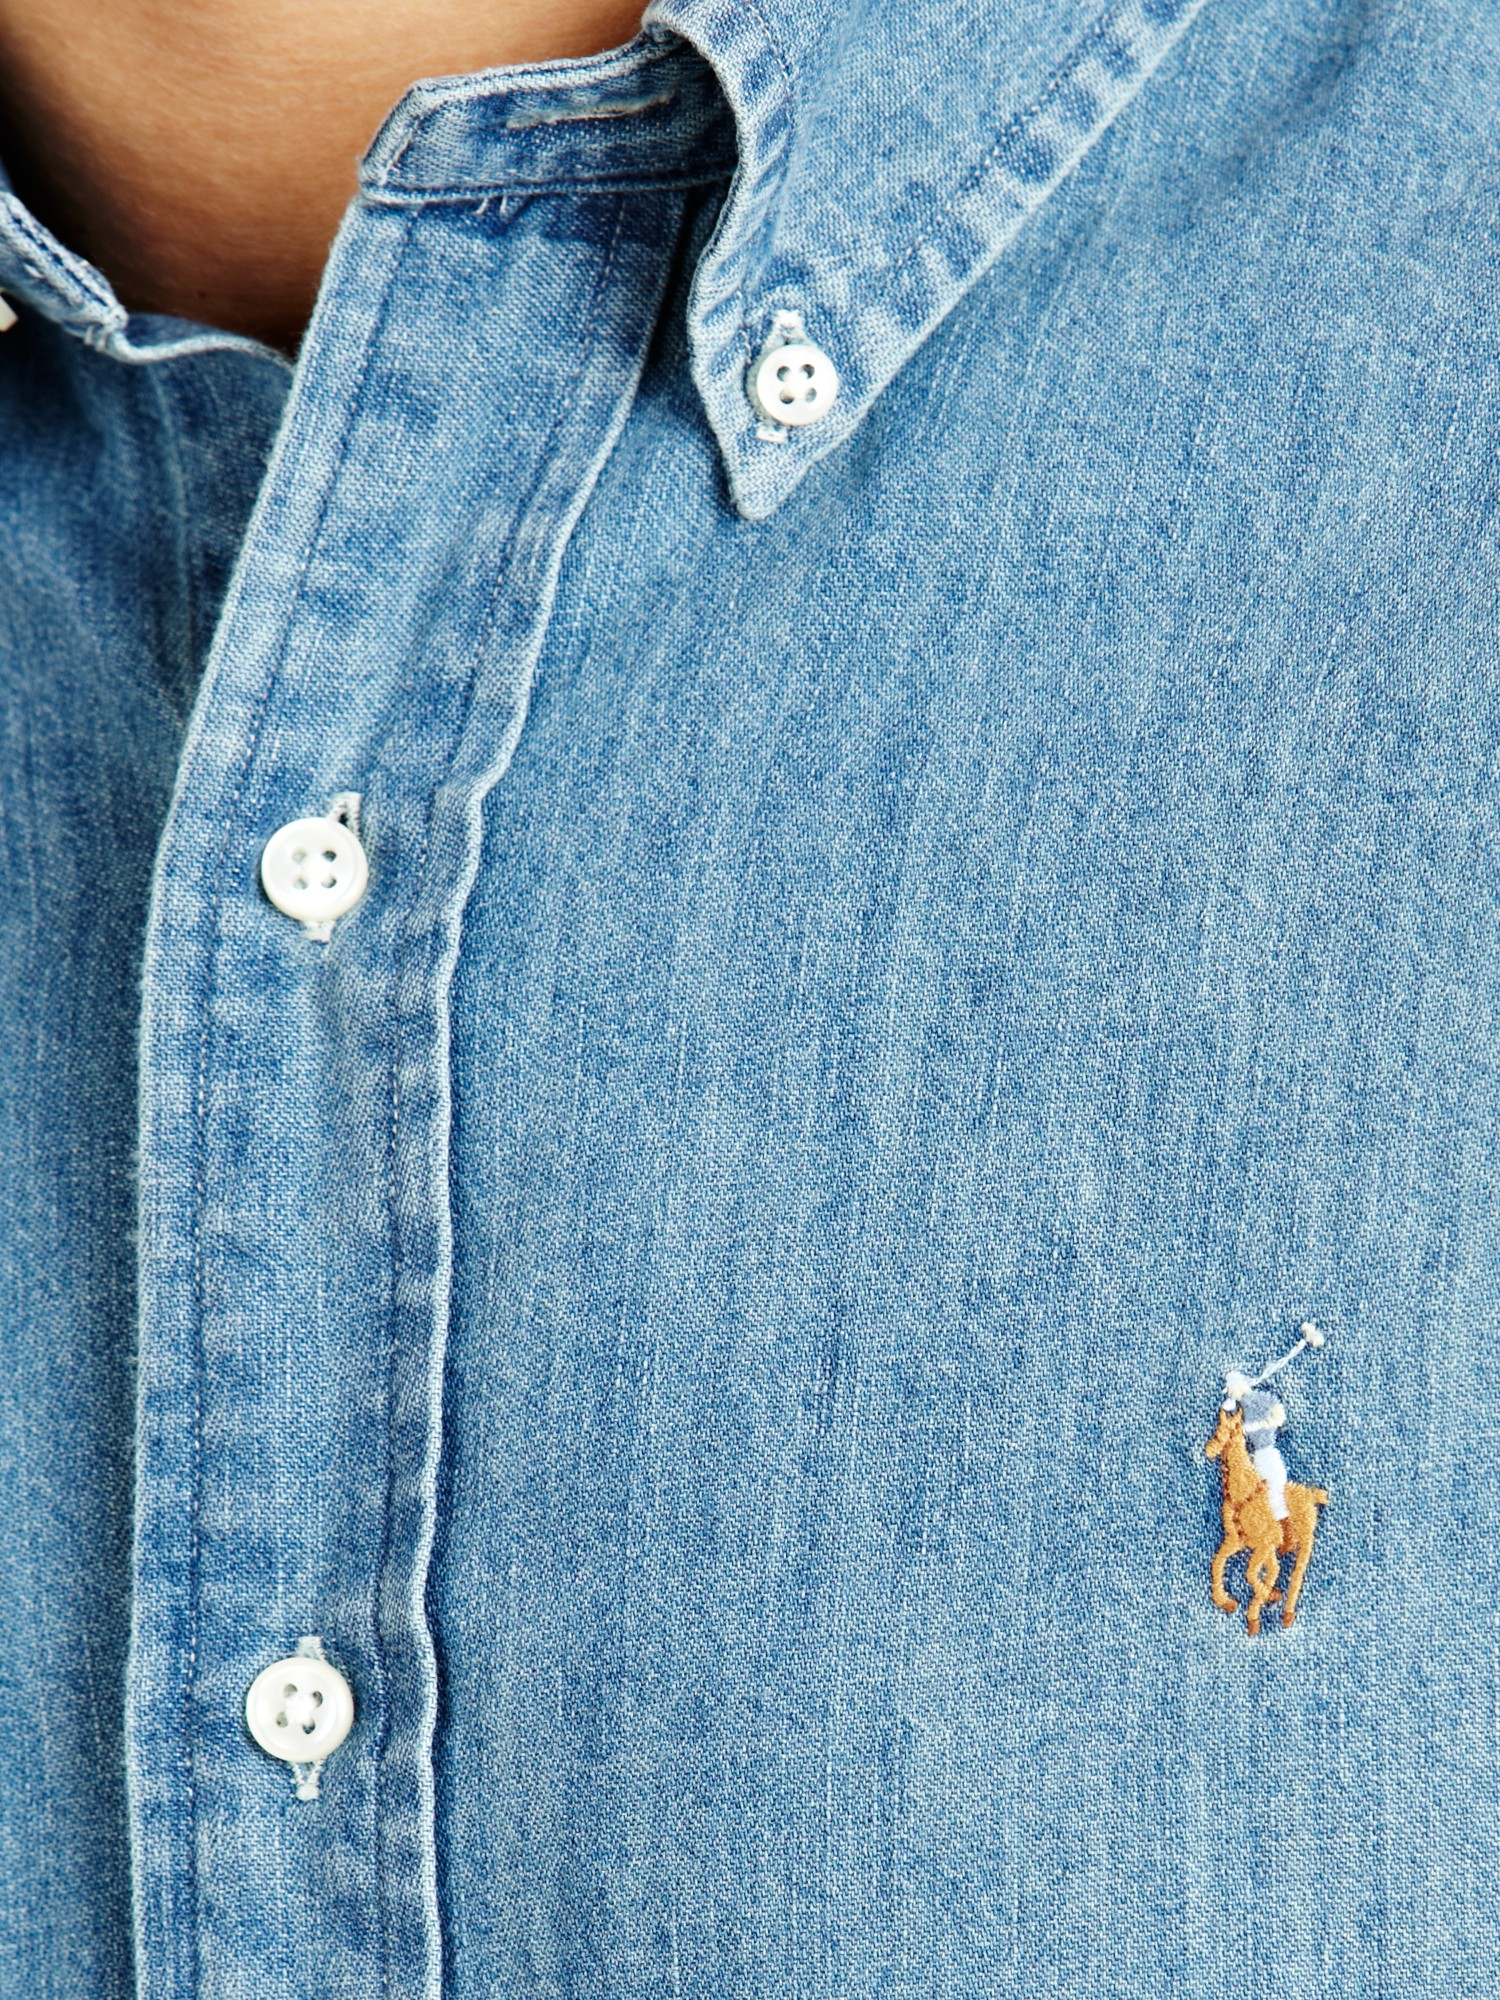 827de5eddd Polo Ralph Lauren Classic-fit Solid Denim Shirt in Blue for Men - Lyst